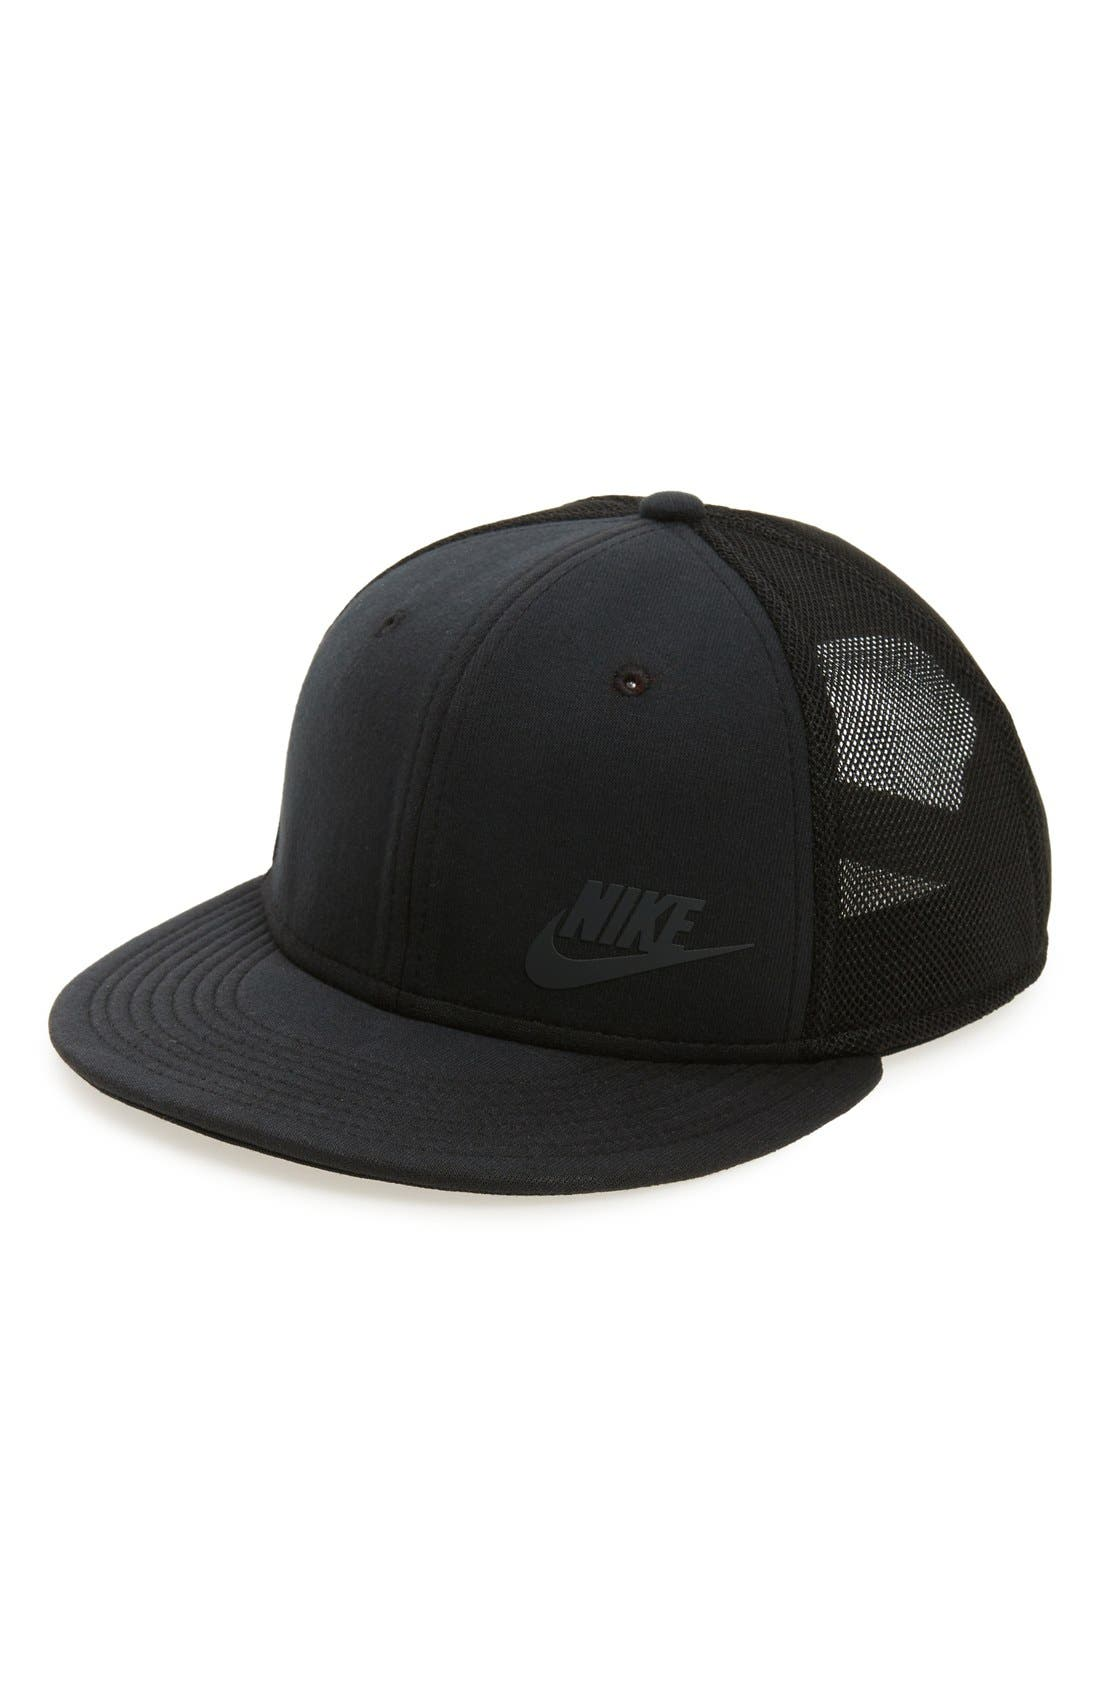 Main Image - Nike 'Tech Pack' Trucker Hat